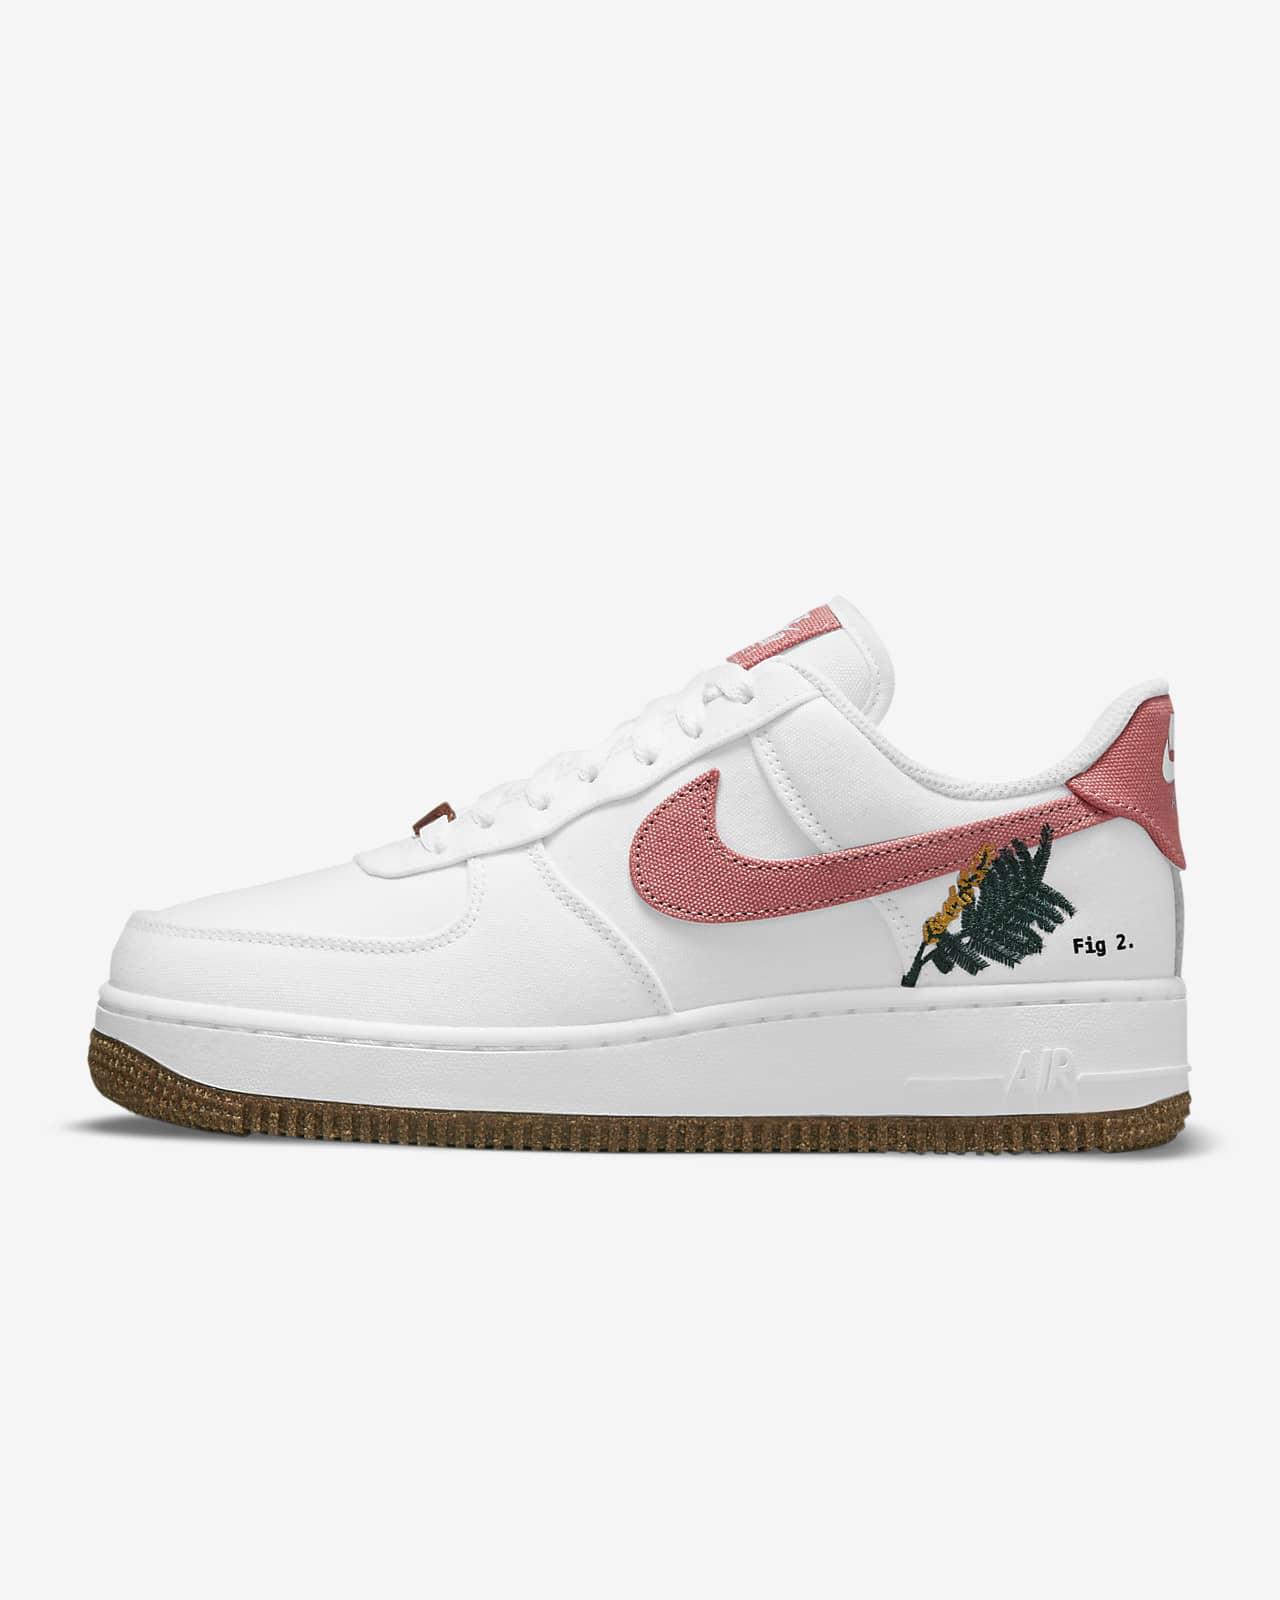 Nike Air Force 1 '07 SE Damenschuh